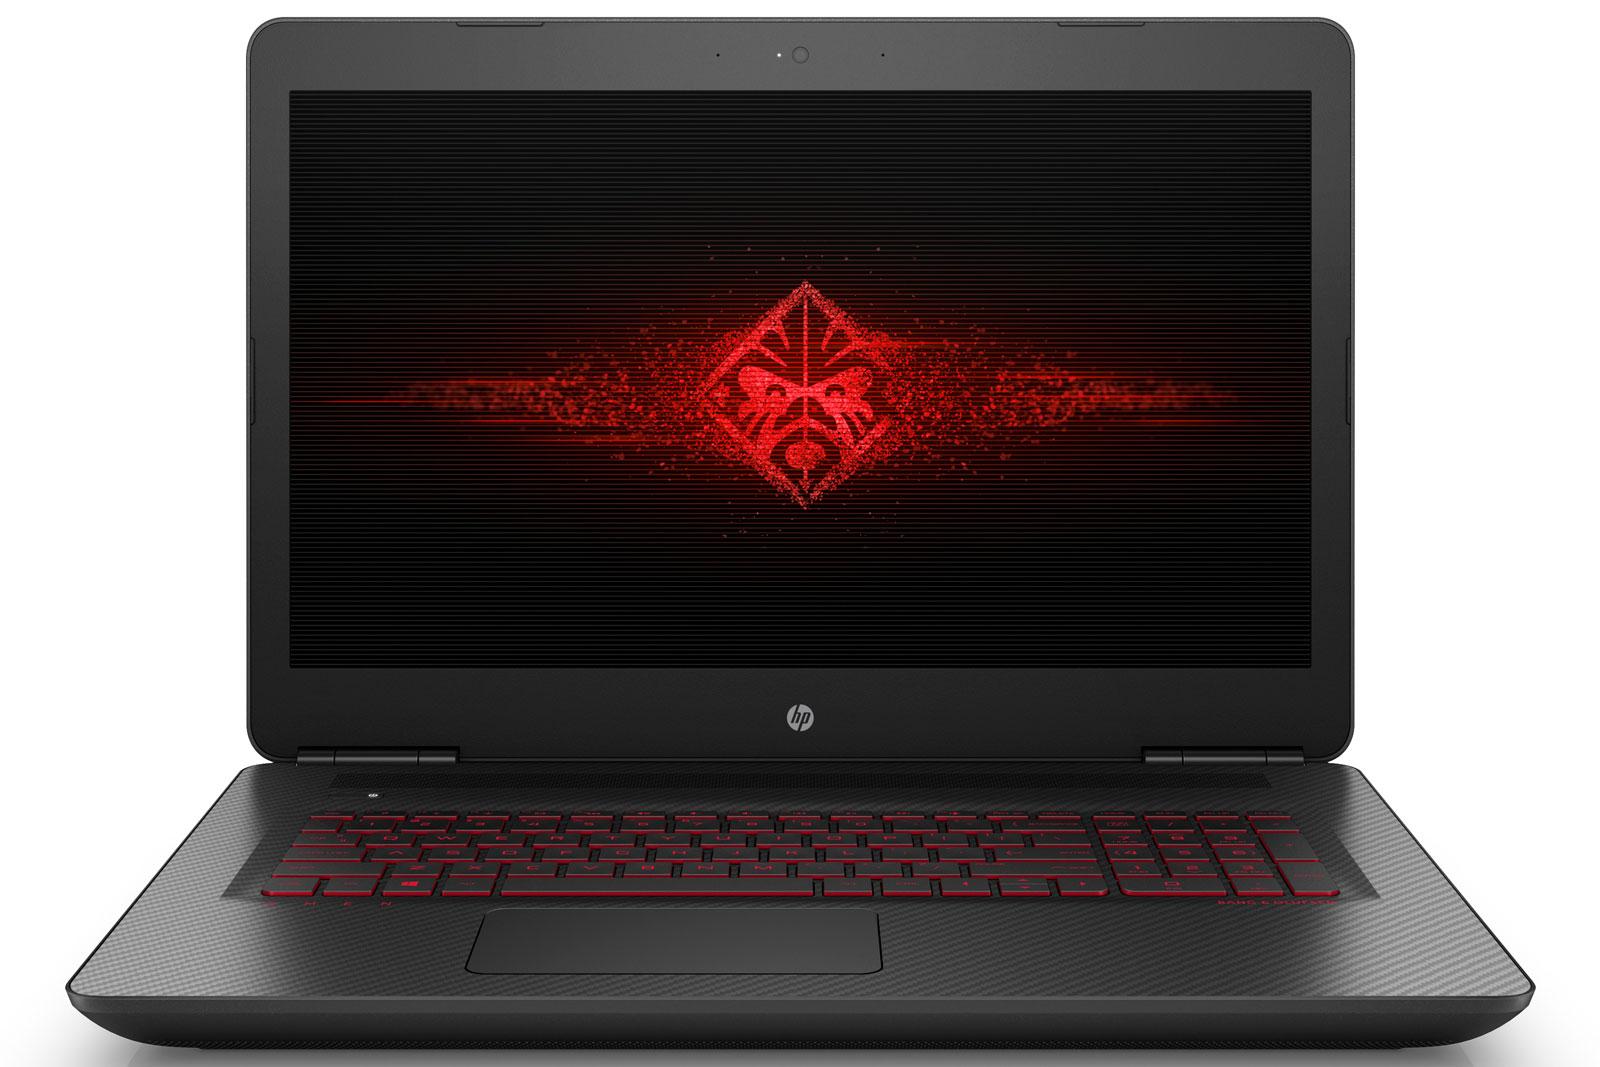 HP 推出造型奇特的「方塊」桌機。和一眾各式 Omen 新品